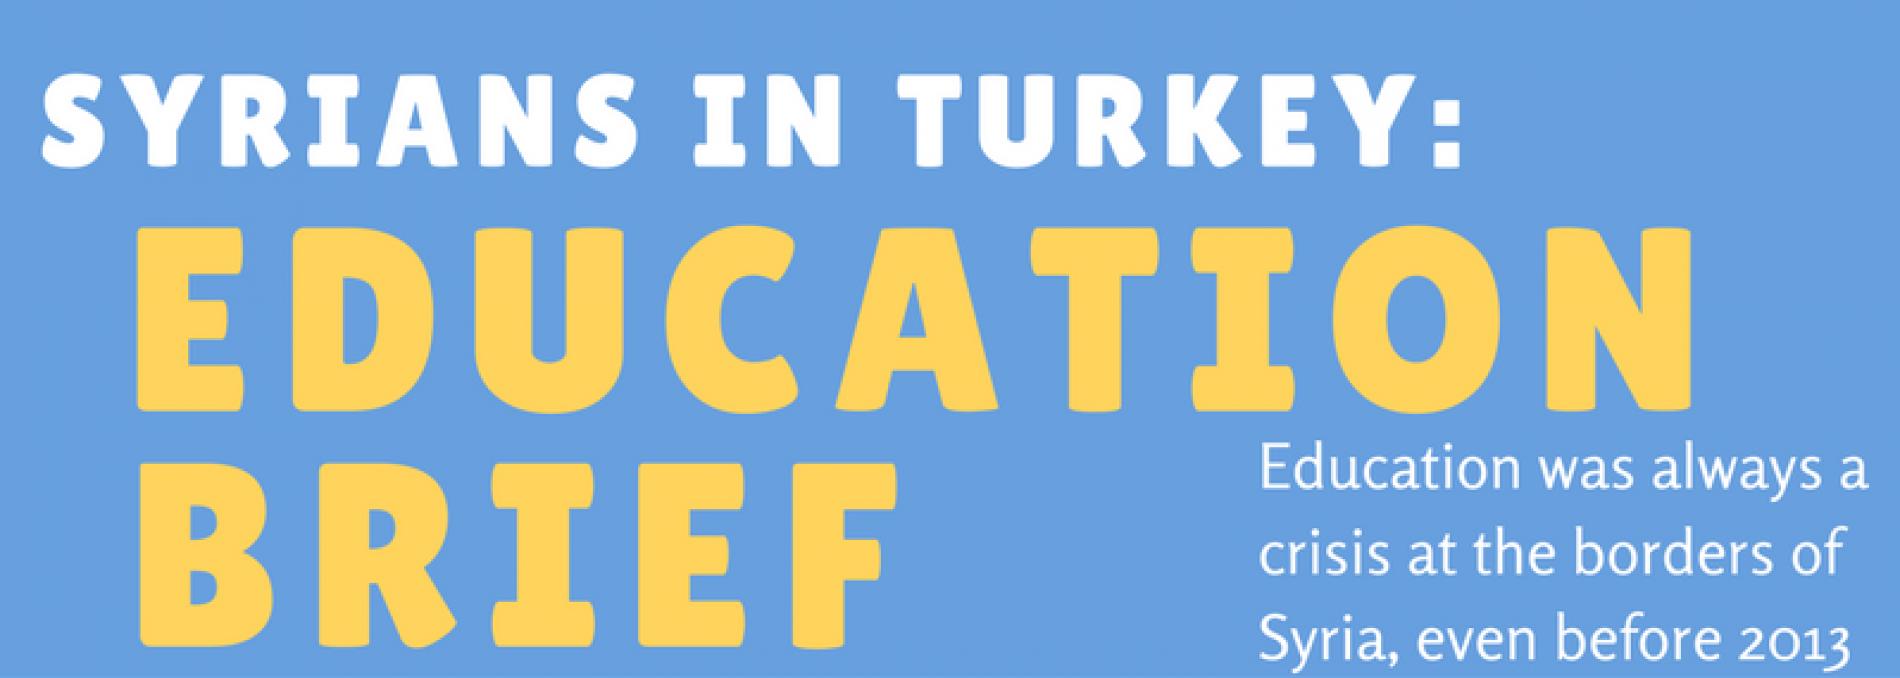 Syrians in Turkey: Education Brief